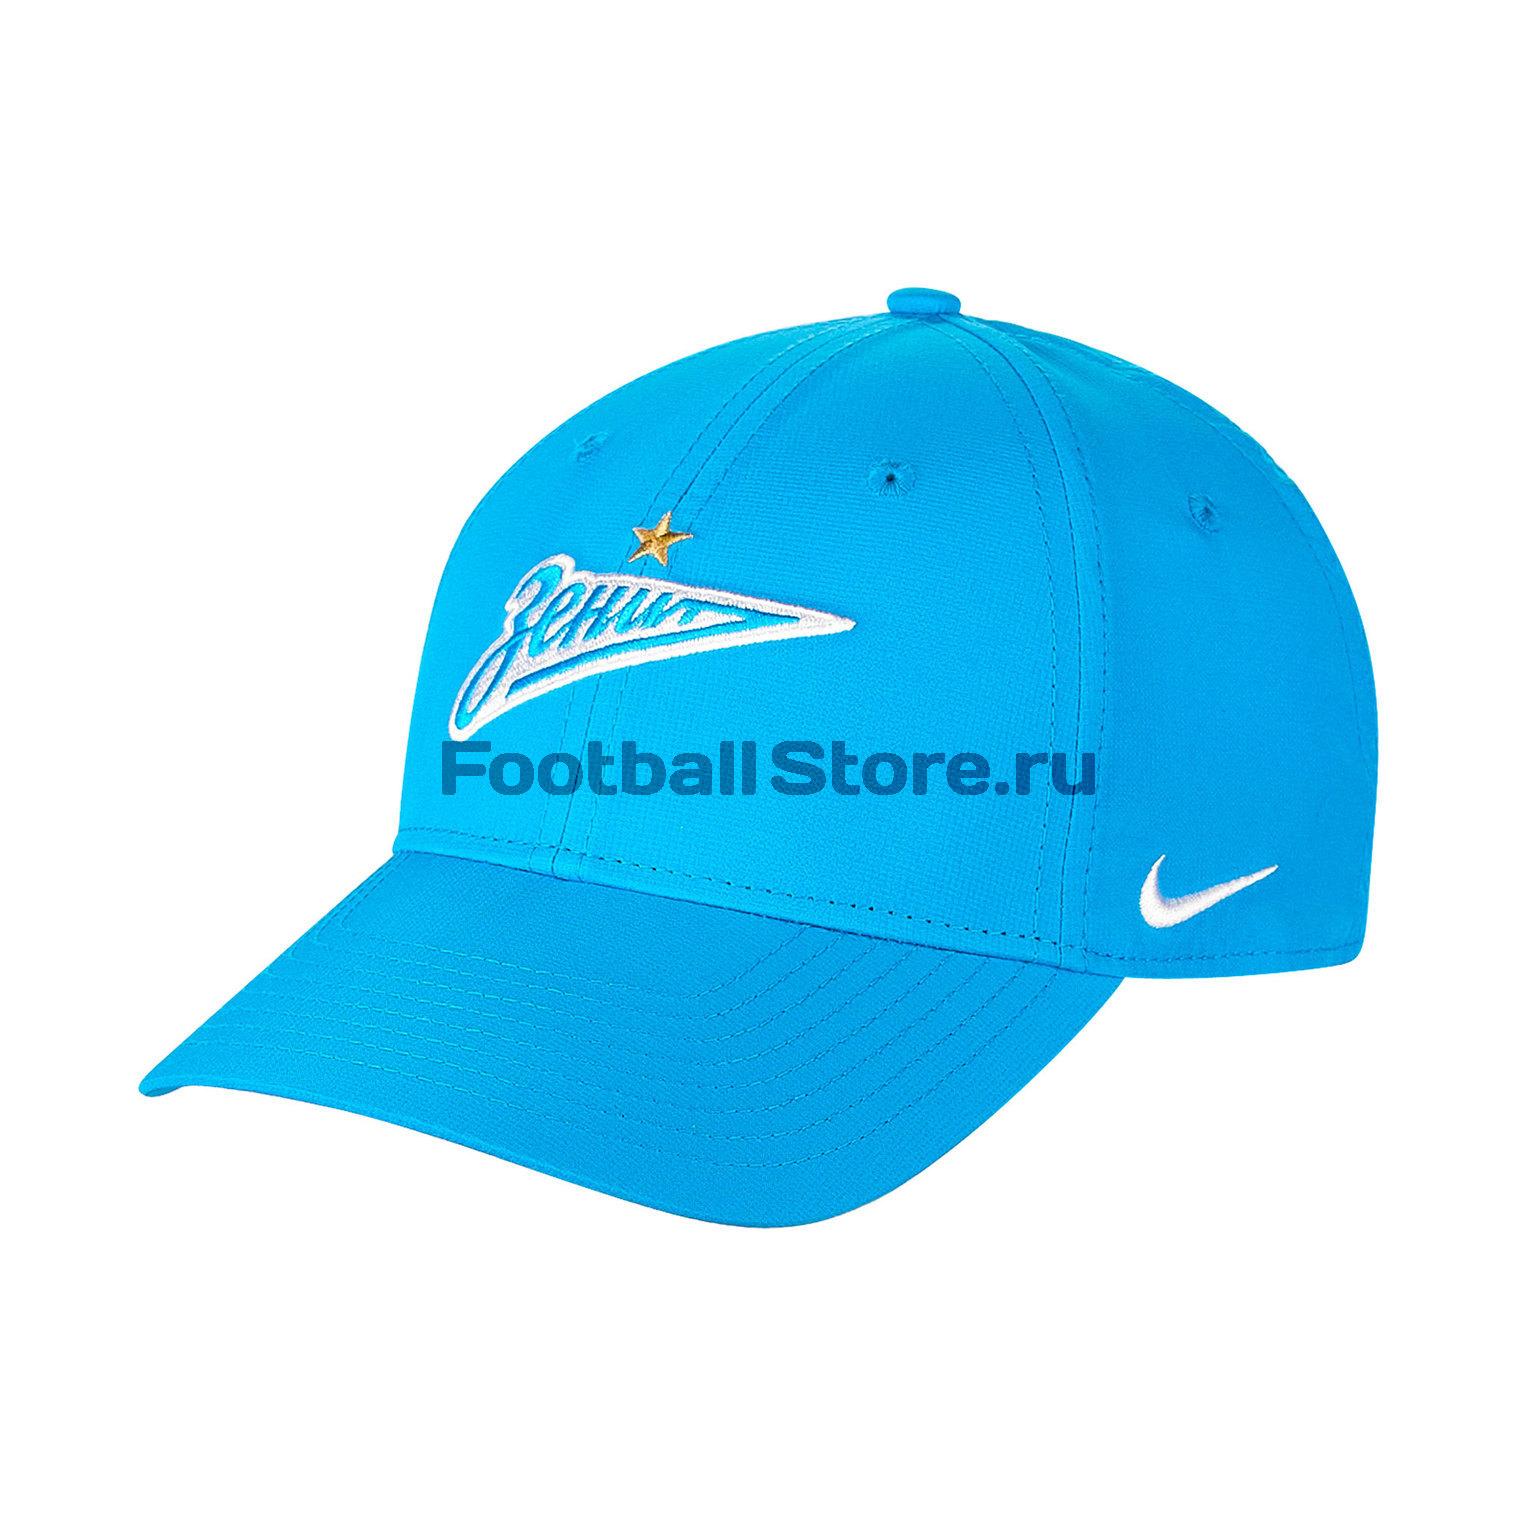 Бейсболка Nike Zenit BV6431-446